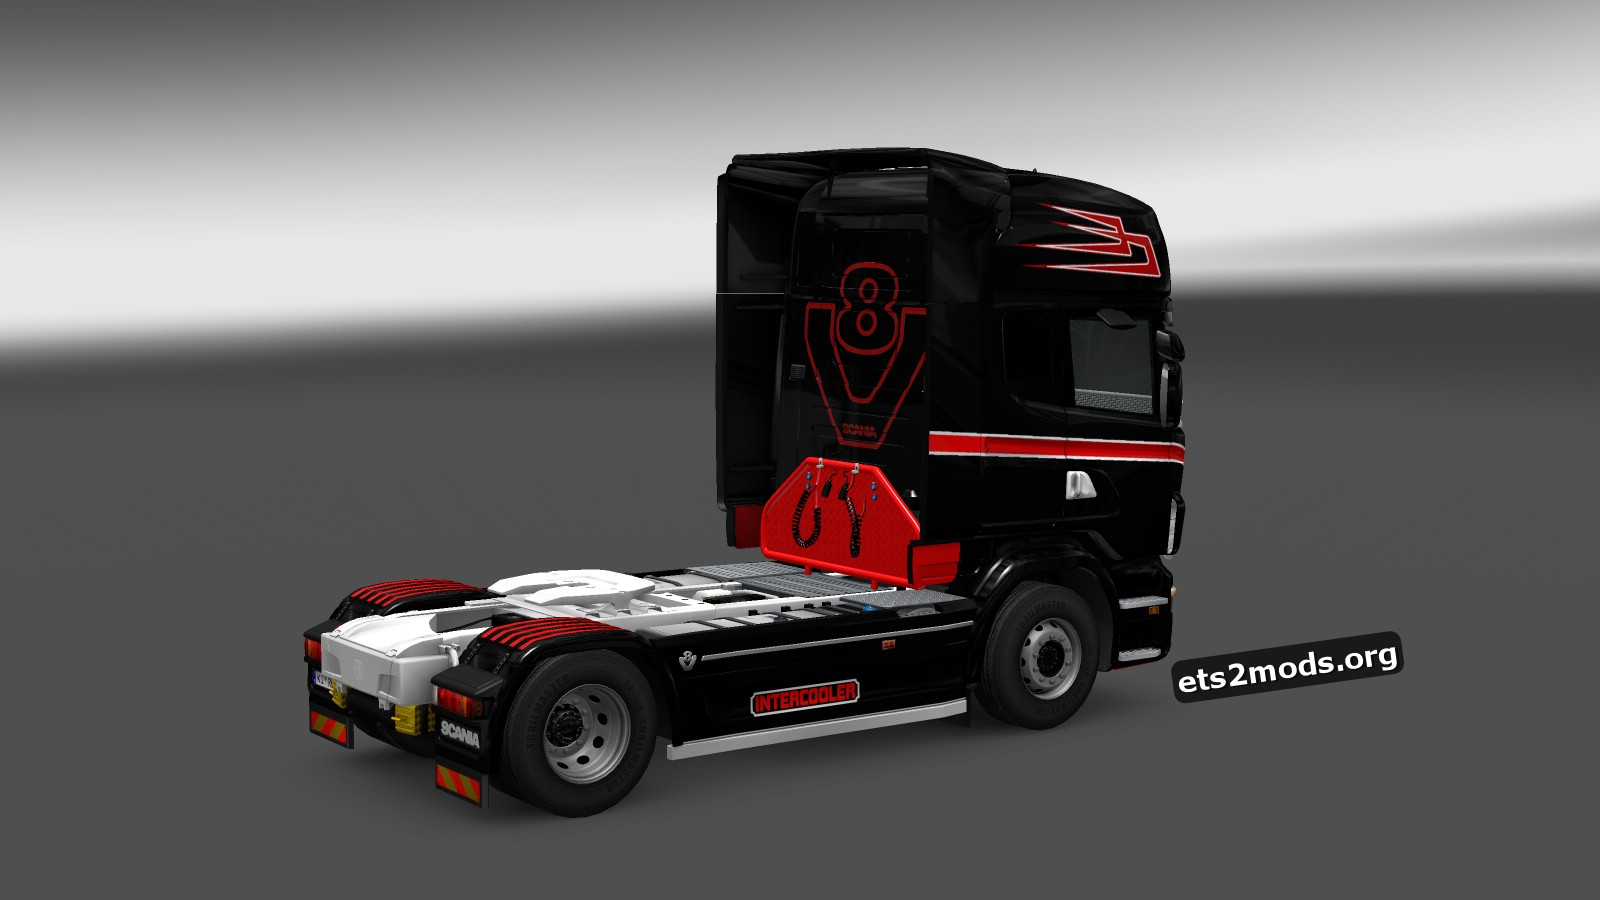 Danmark Scania Skin for Scania RJL